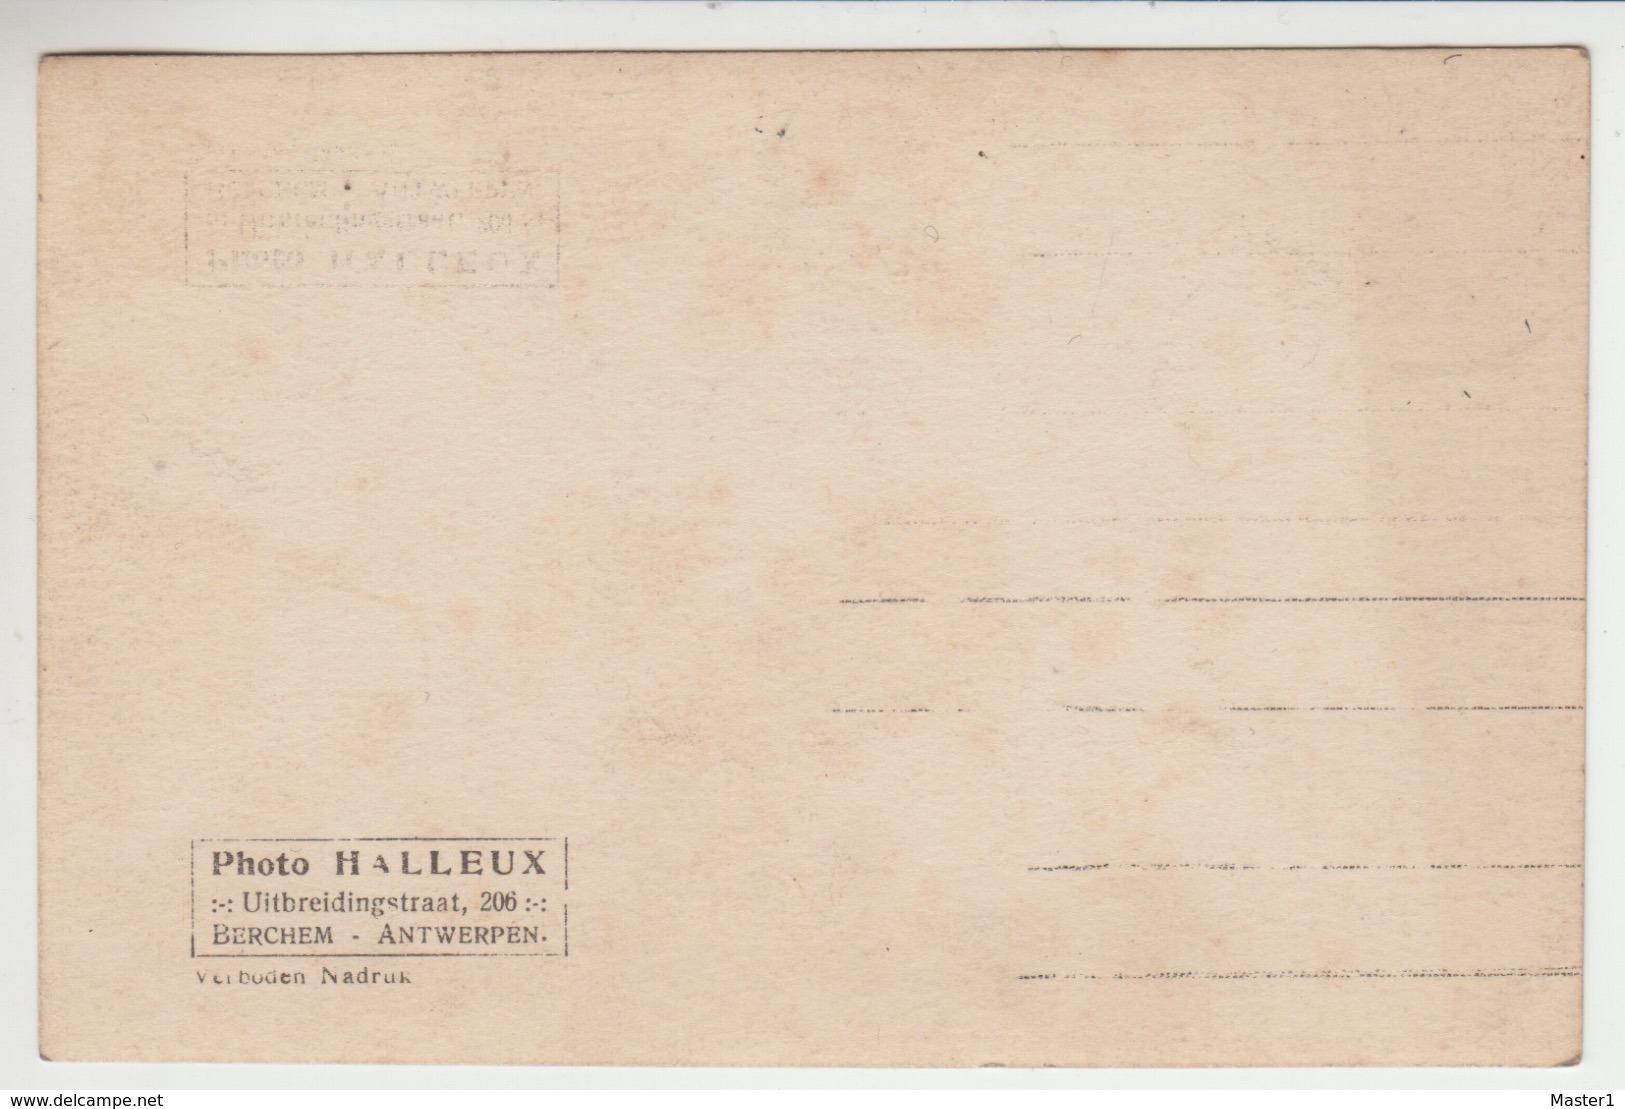 PHOTO CARD BOXING BOKSEN LA BOXE / BRUXELLES 1926 / PIET HOBIN Antwerpen X LEO DARTON Charleroi 15/4/1926, Photo Halleux - Boxe